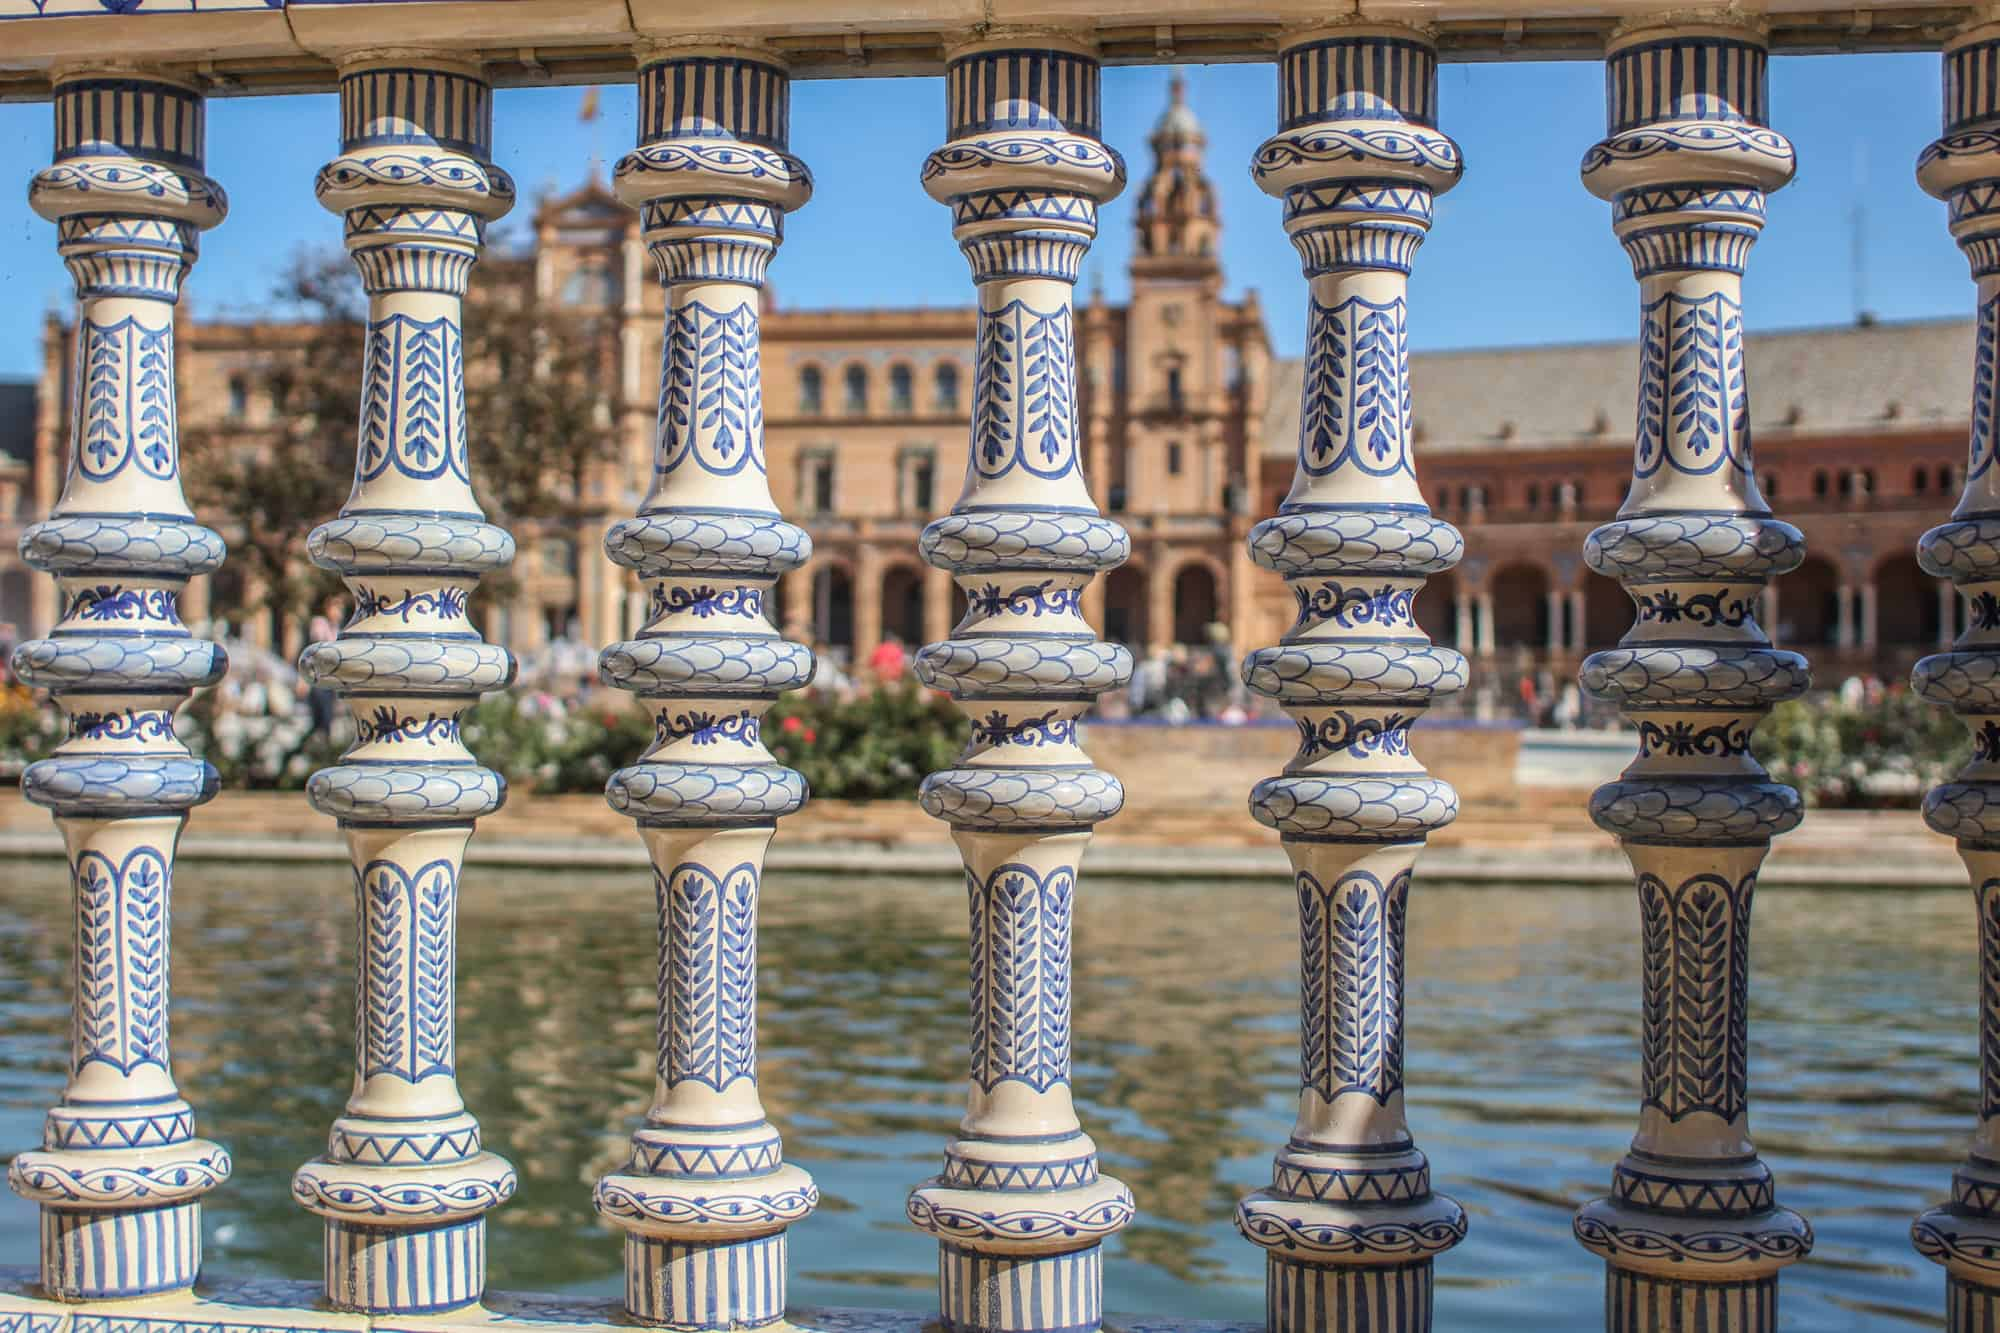 Plaza de Espana durch Gelaender